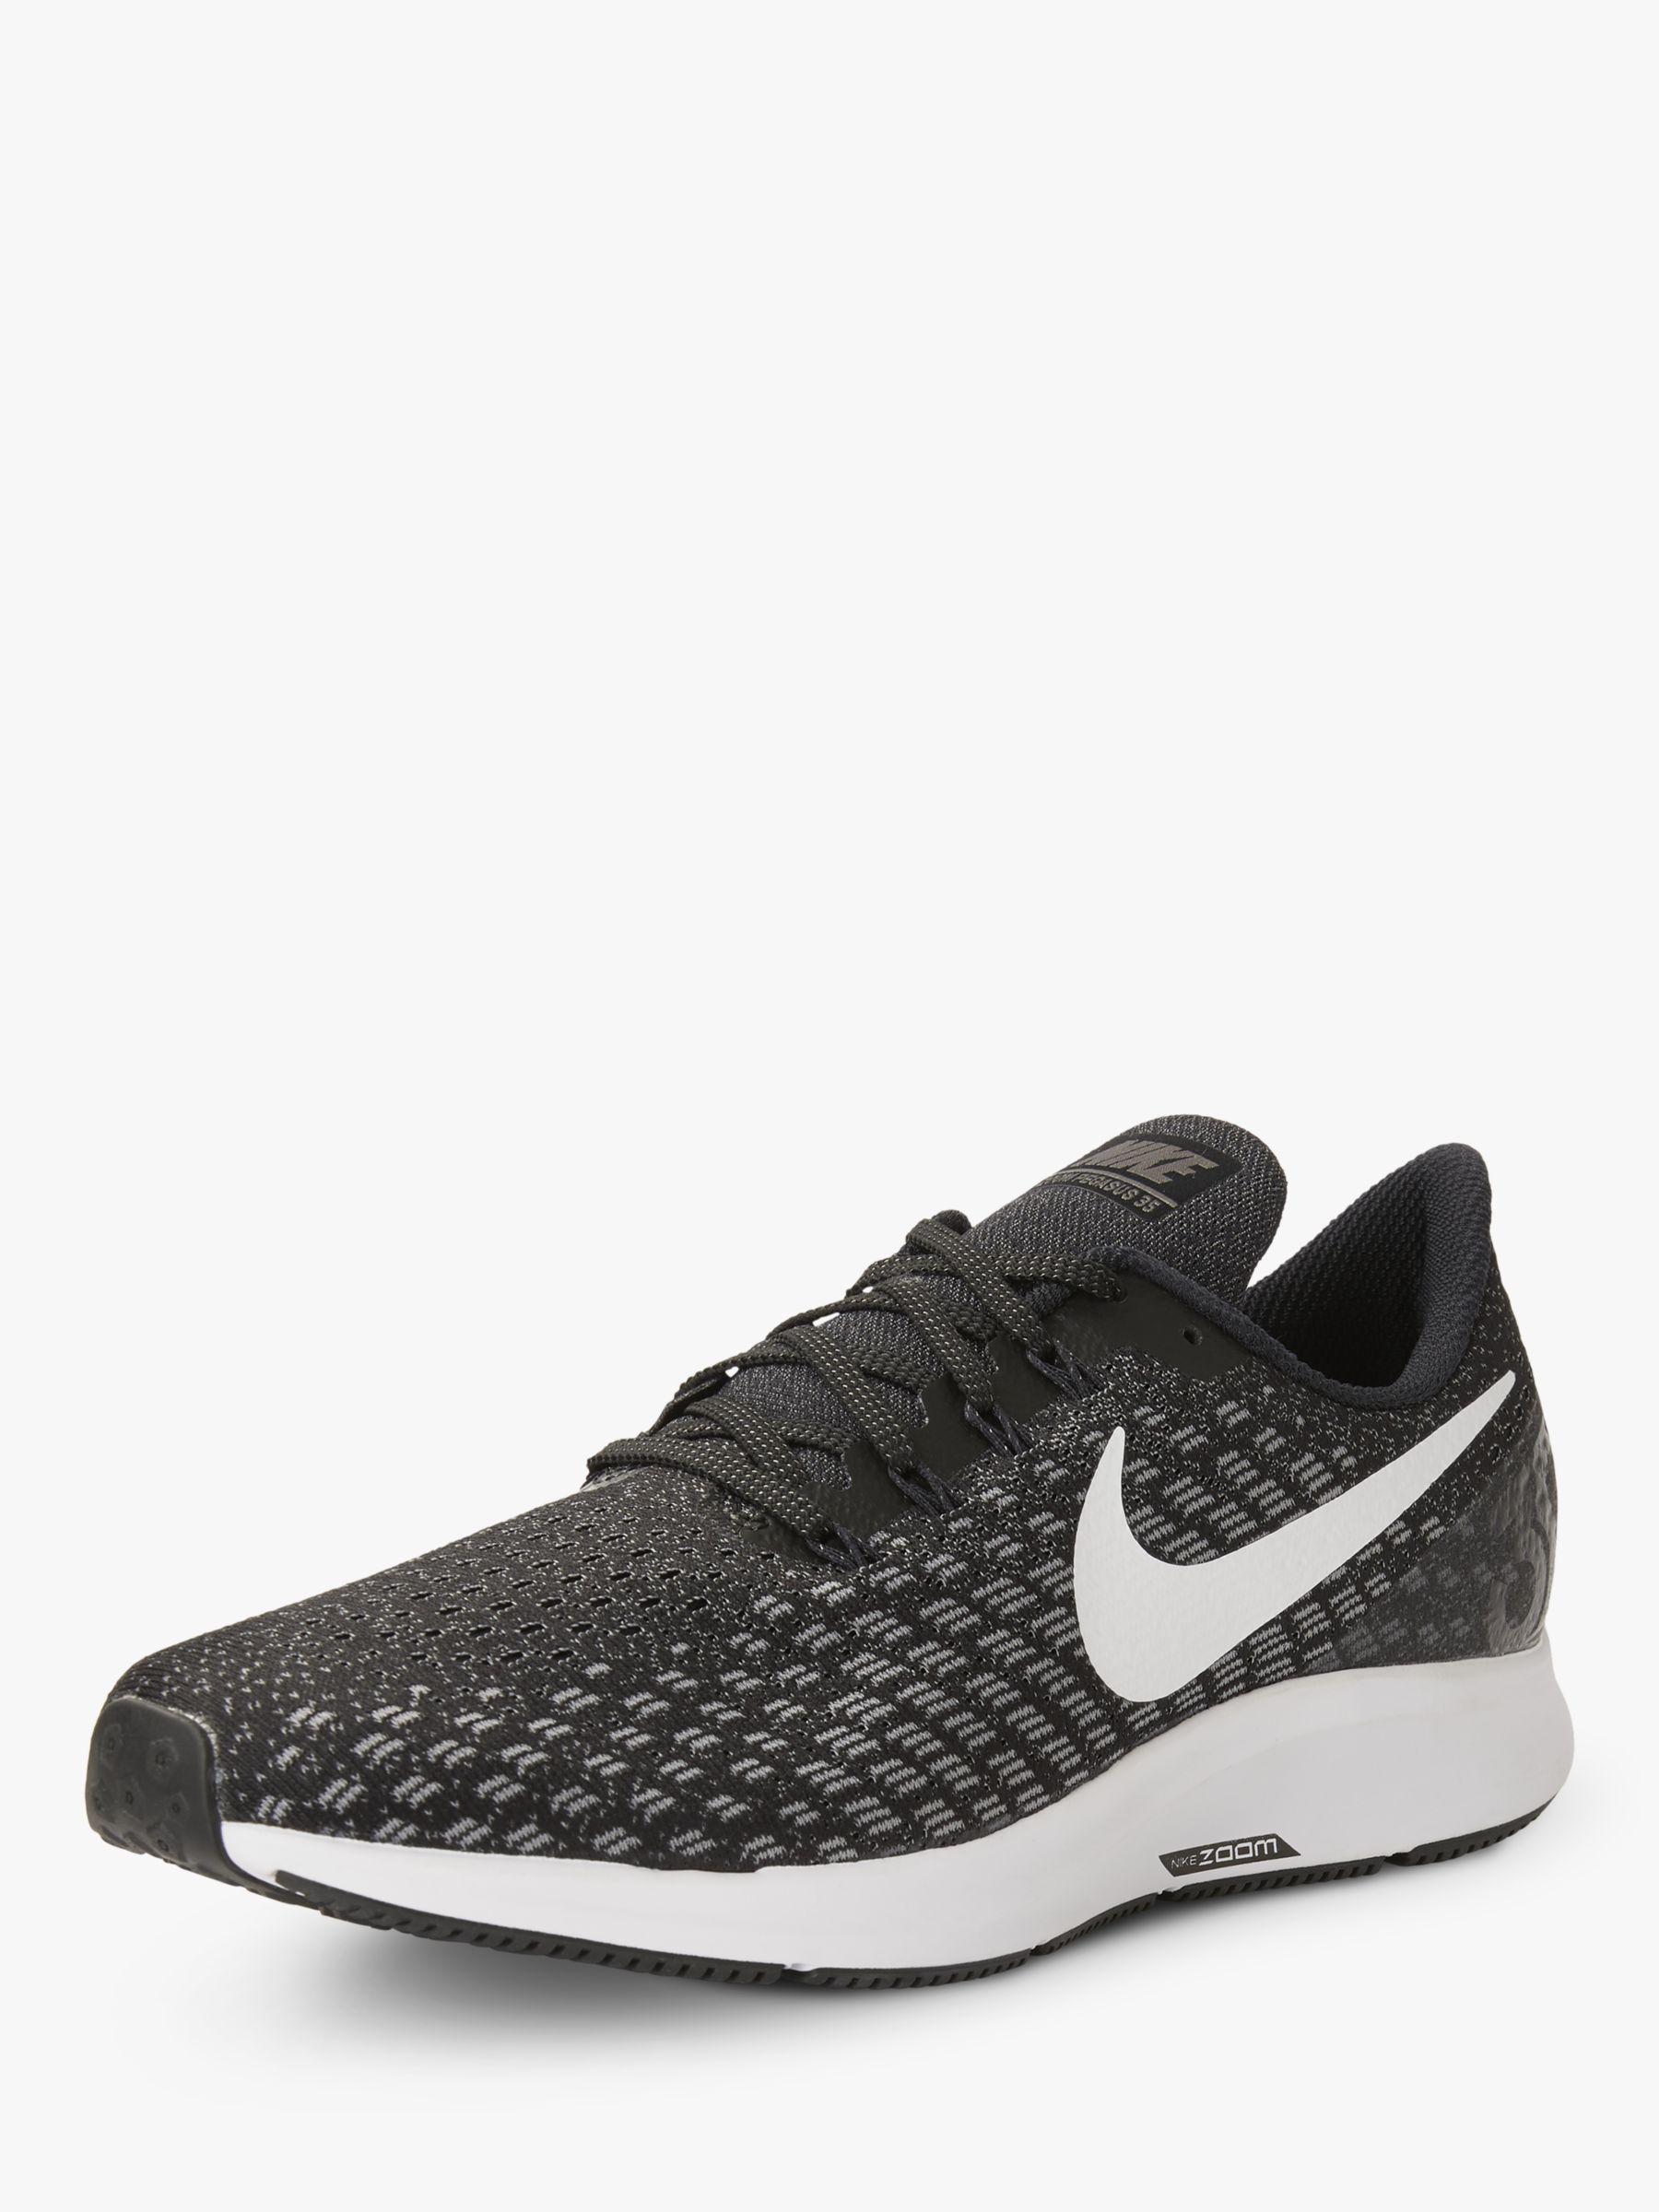 Nike Rubber Air Zoom Pegasus 35 Men's Running Shoes in Black for Men